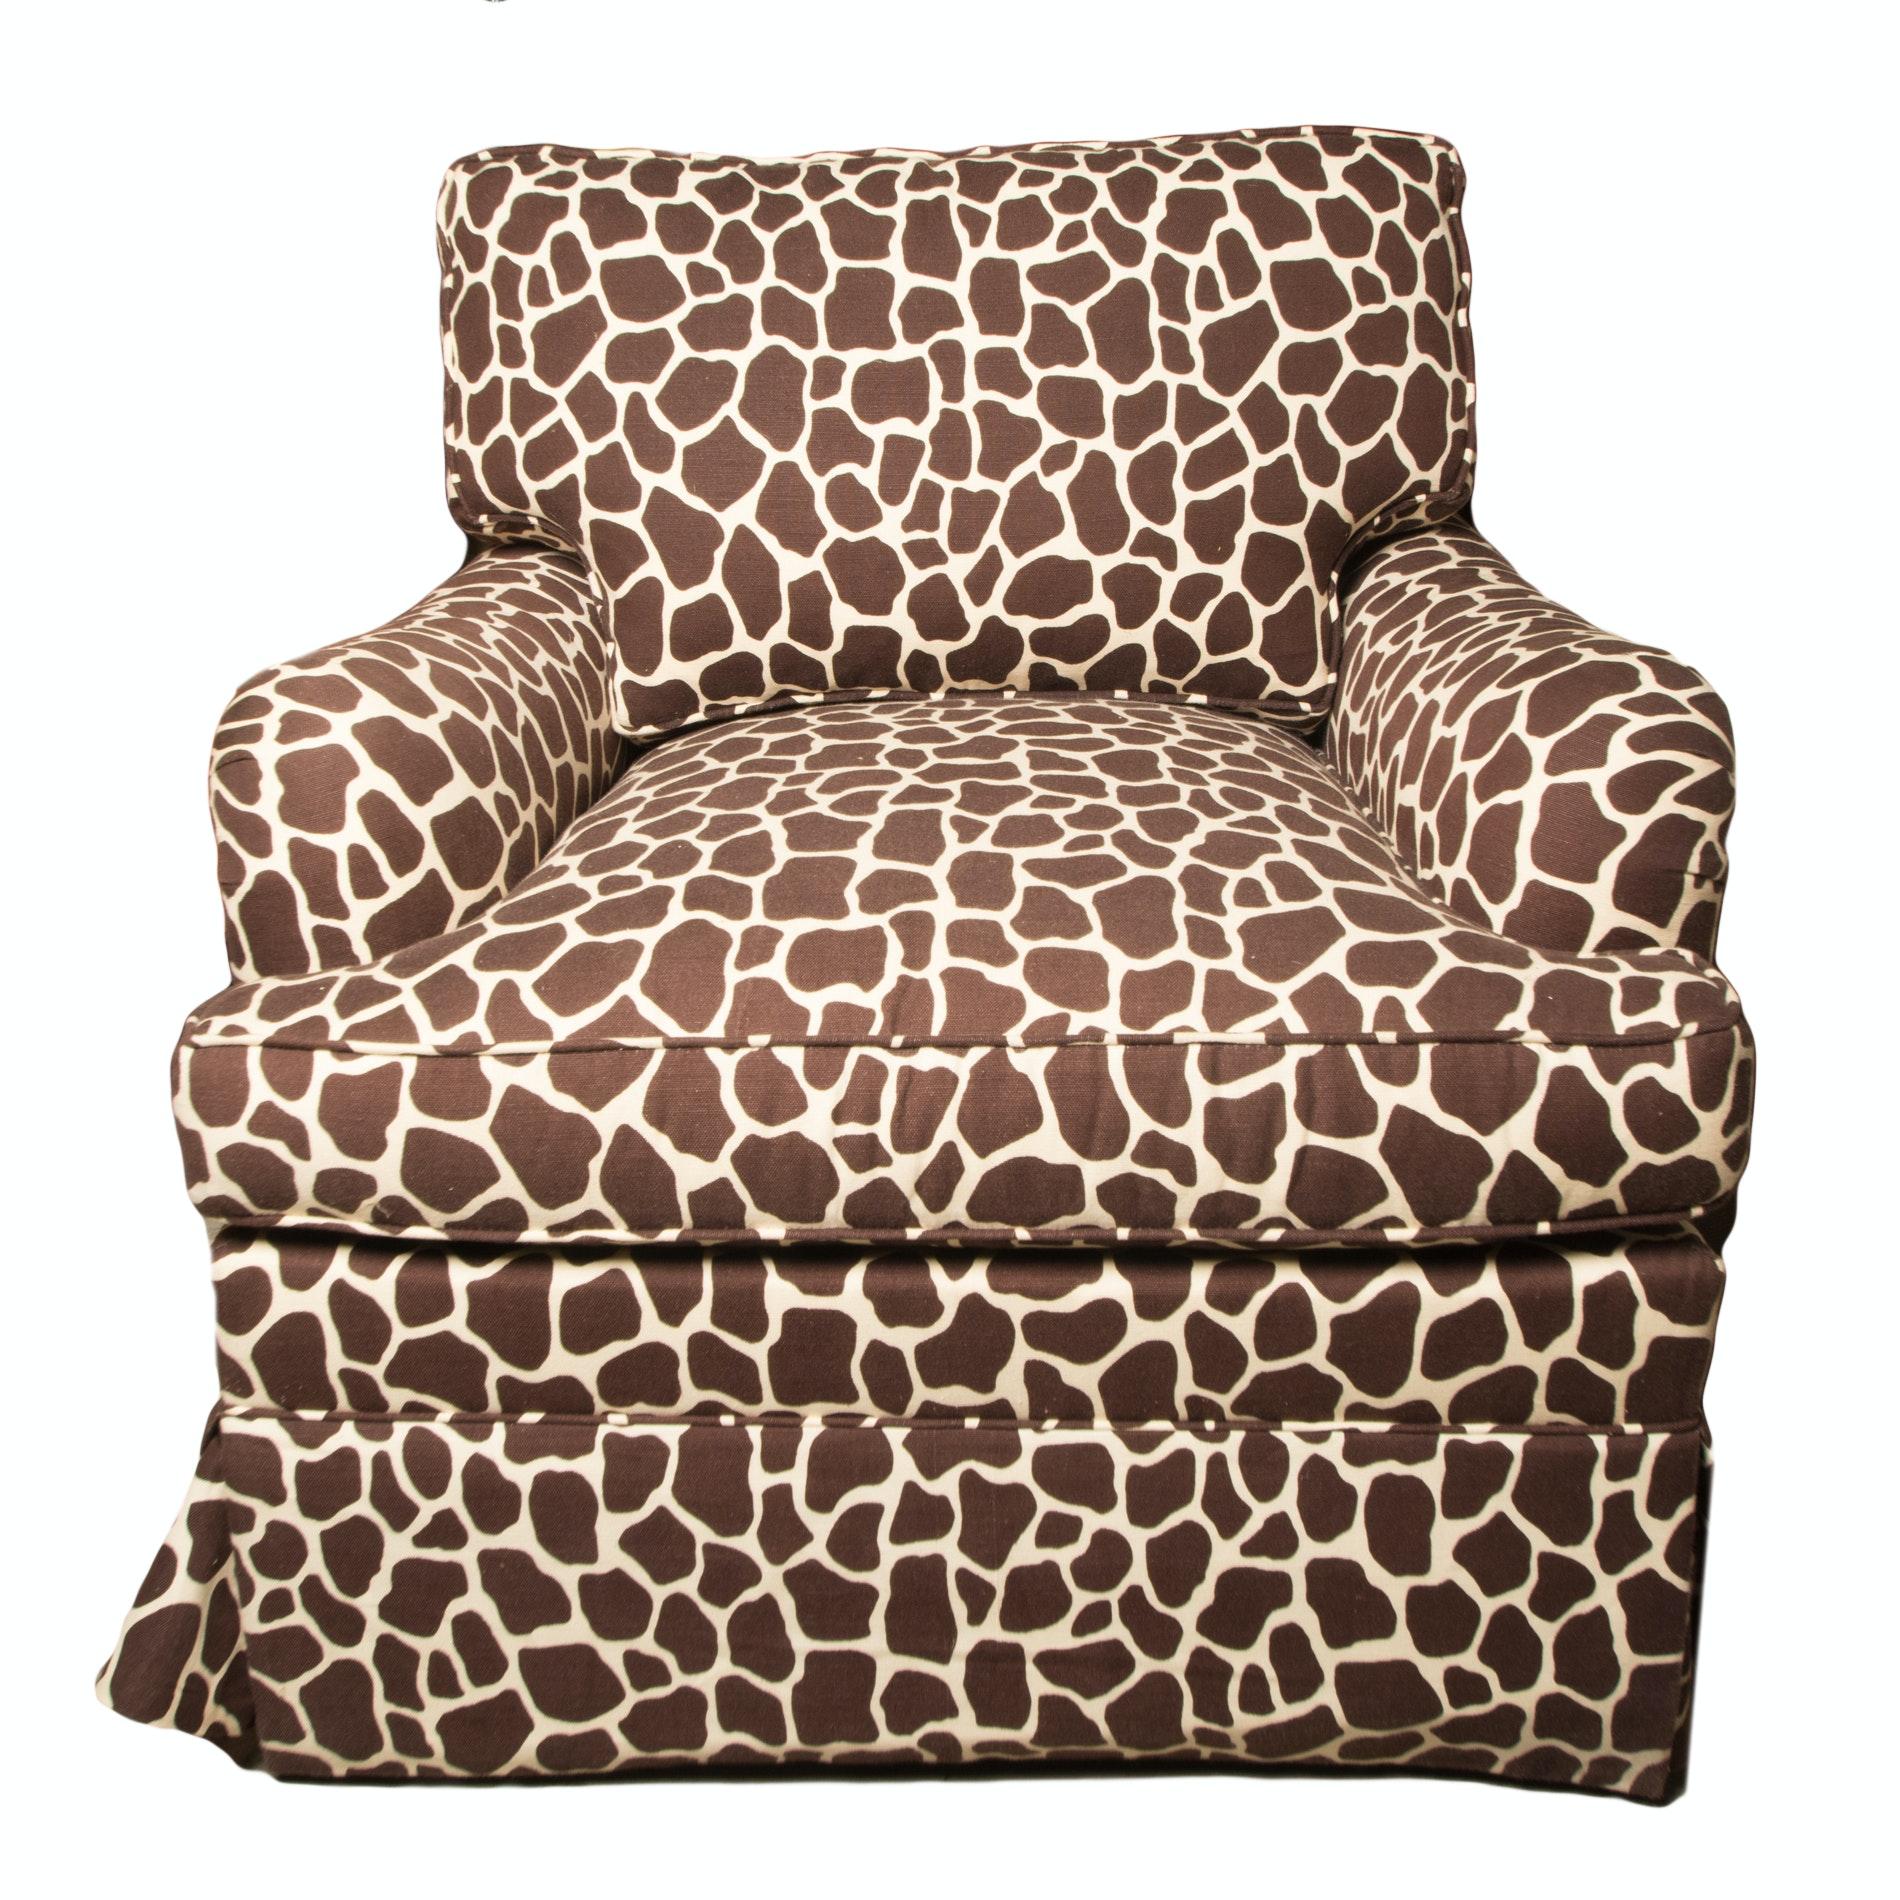 Giraffe Print Armchair by The Charles Stewart Company